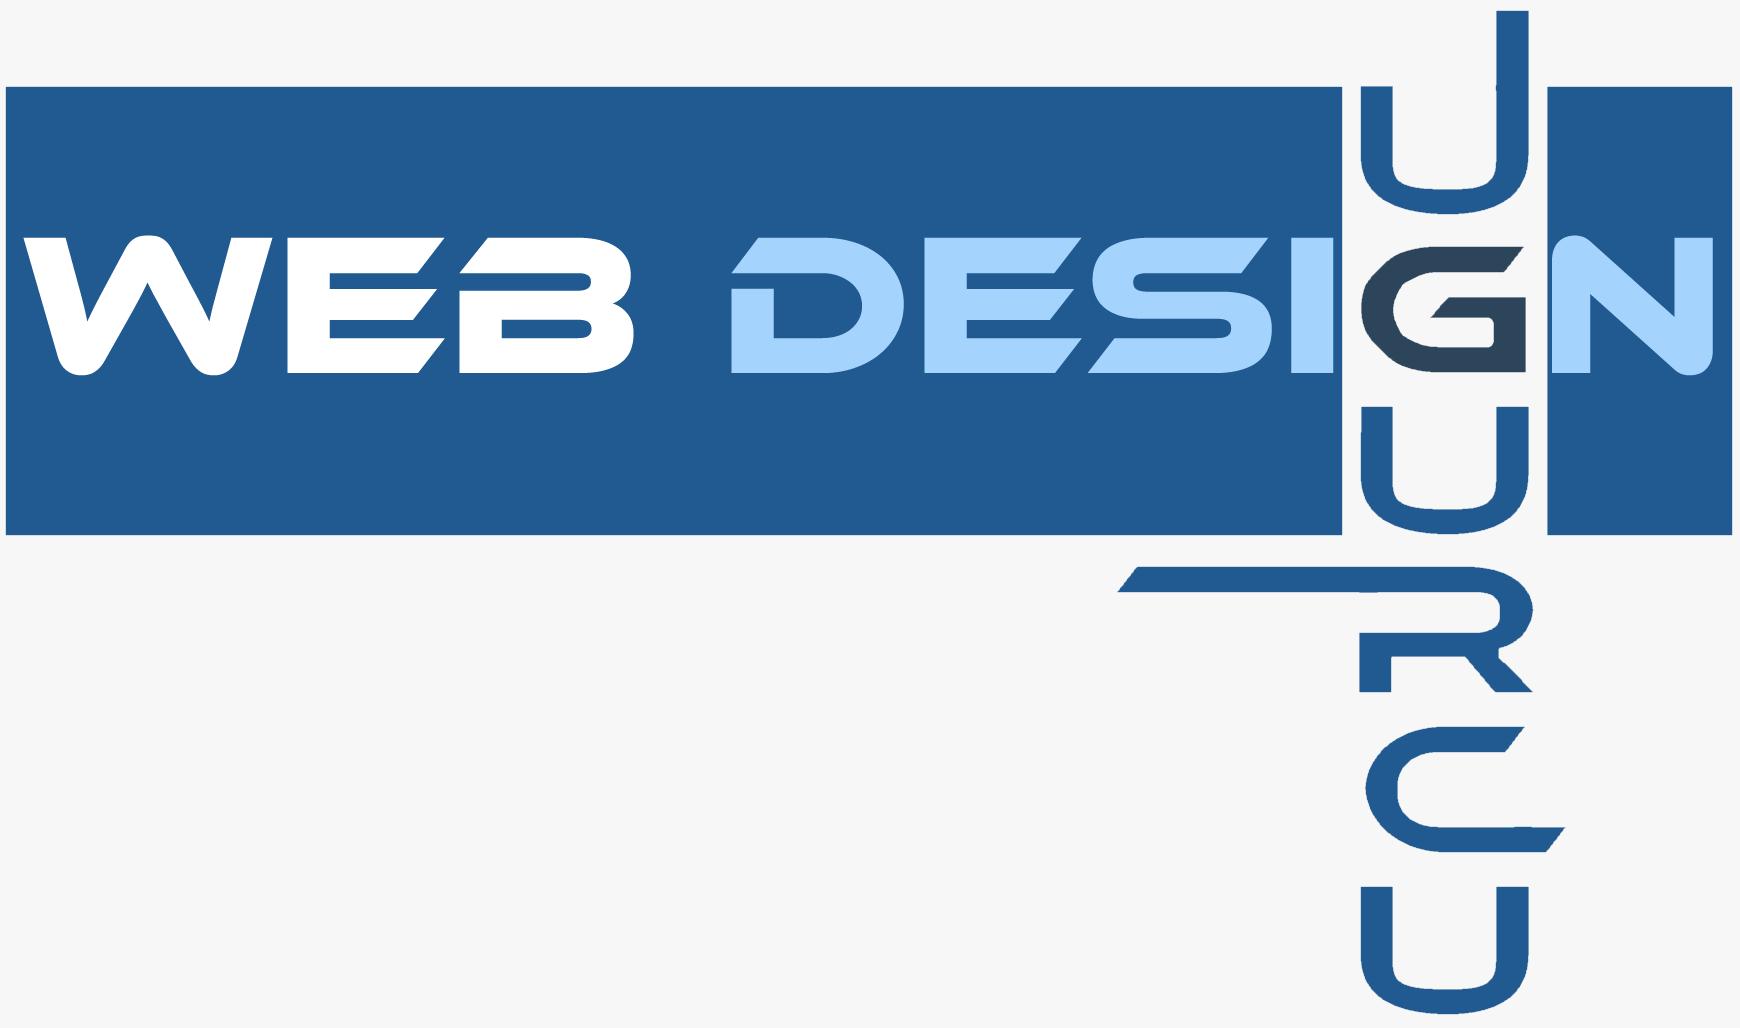 webdesign-ugurcu